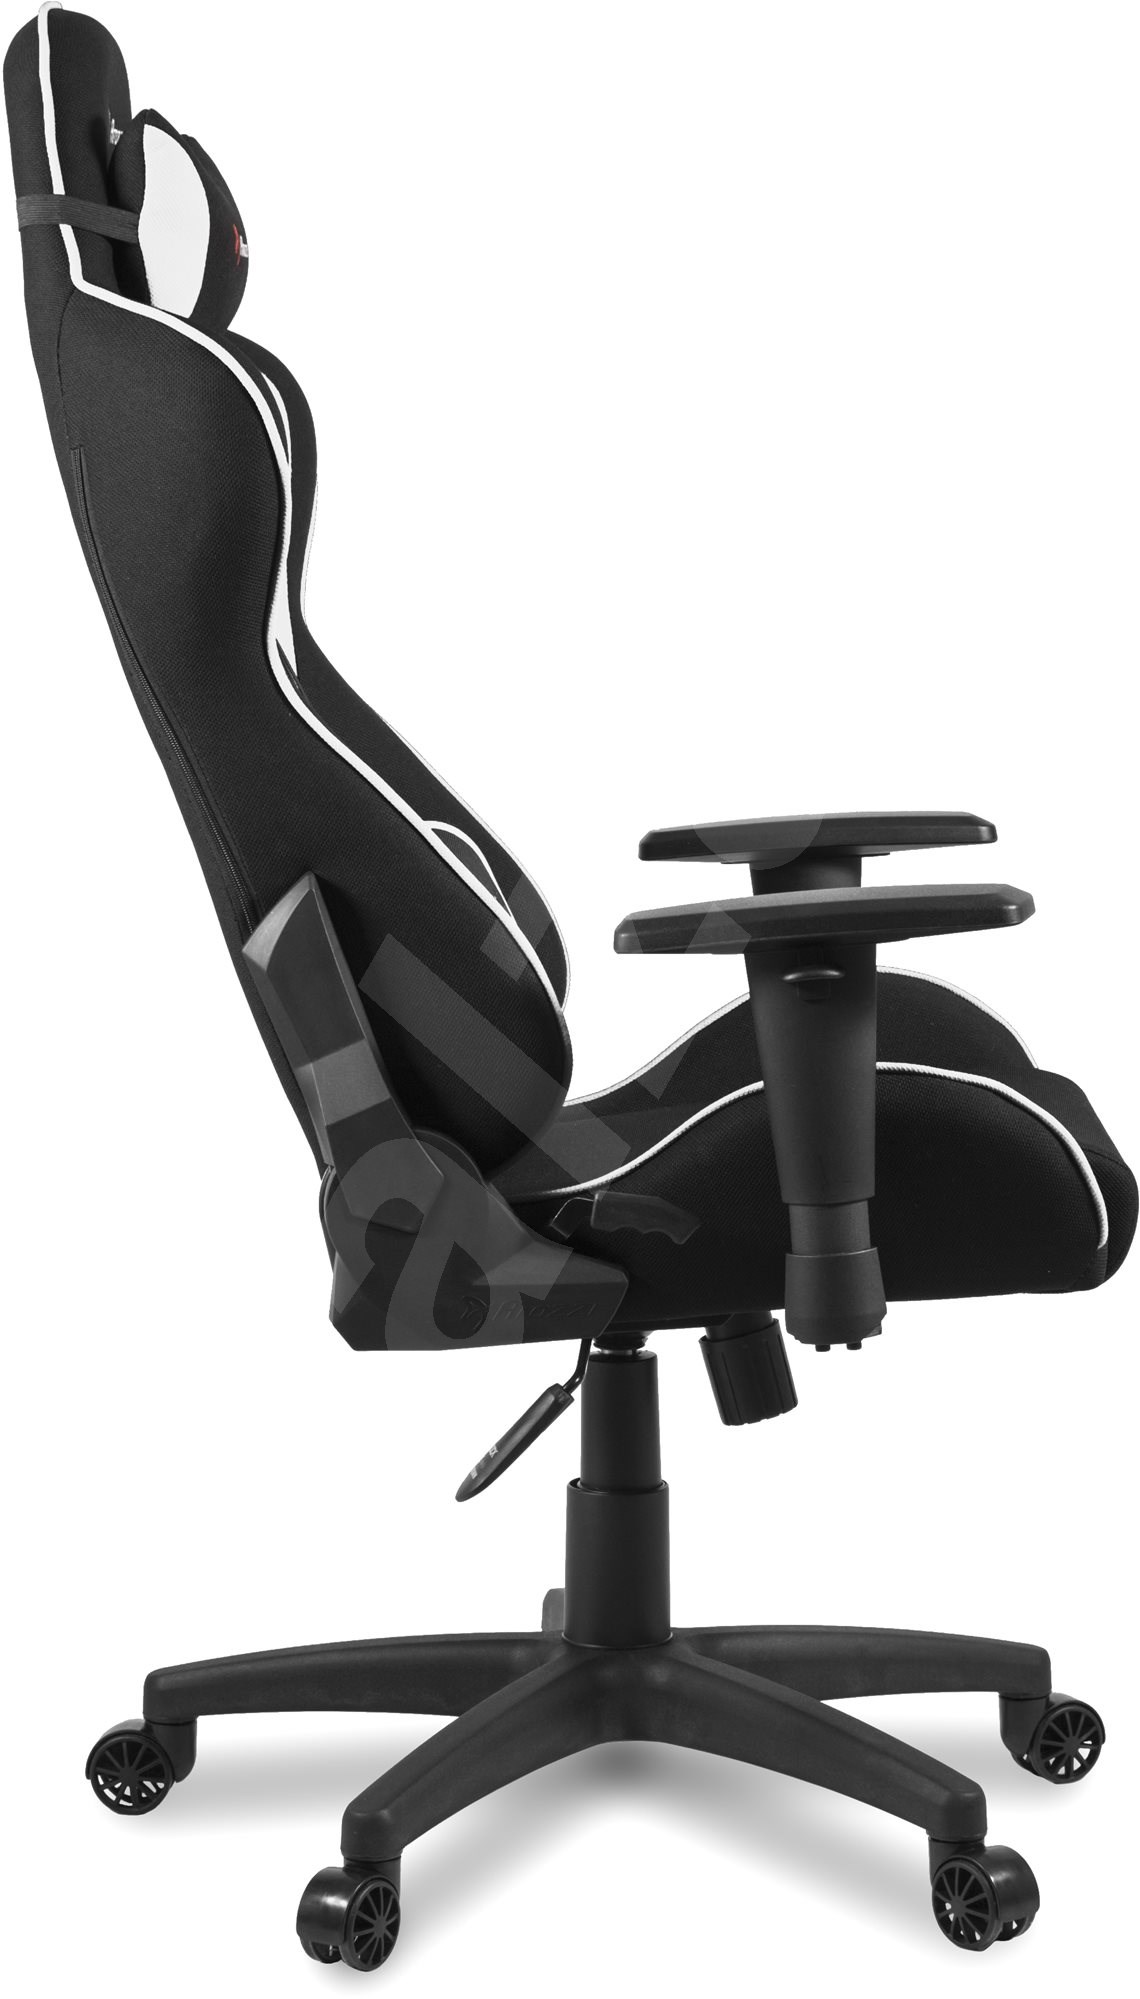 Arozzi Mezzo V2 Stoff Weiß Gaming Stuhl